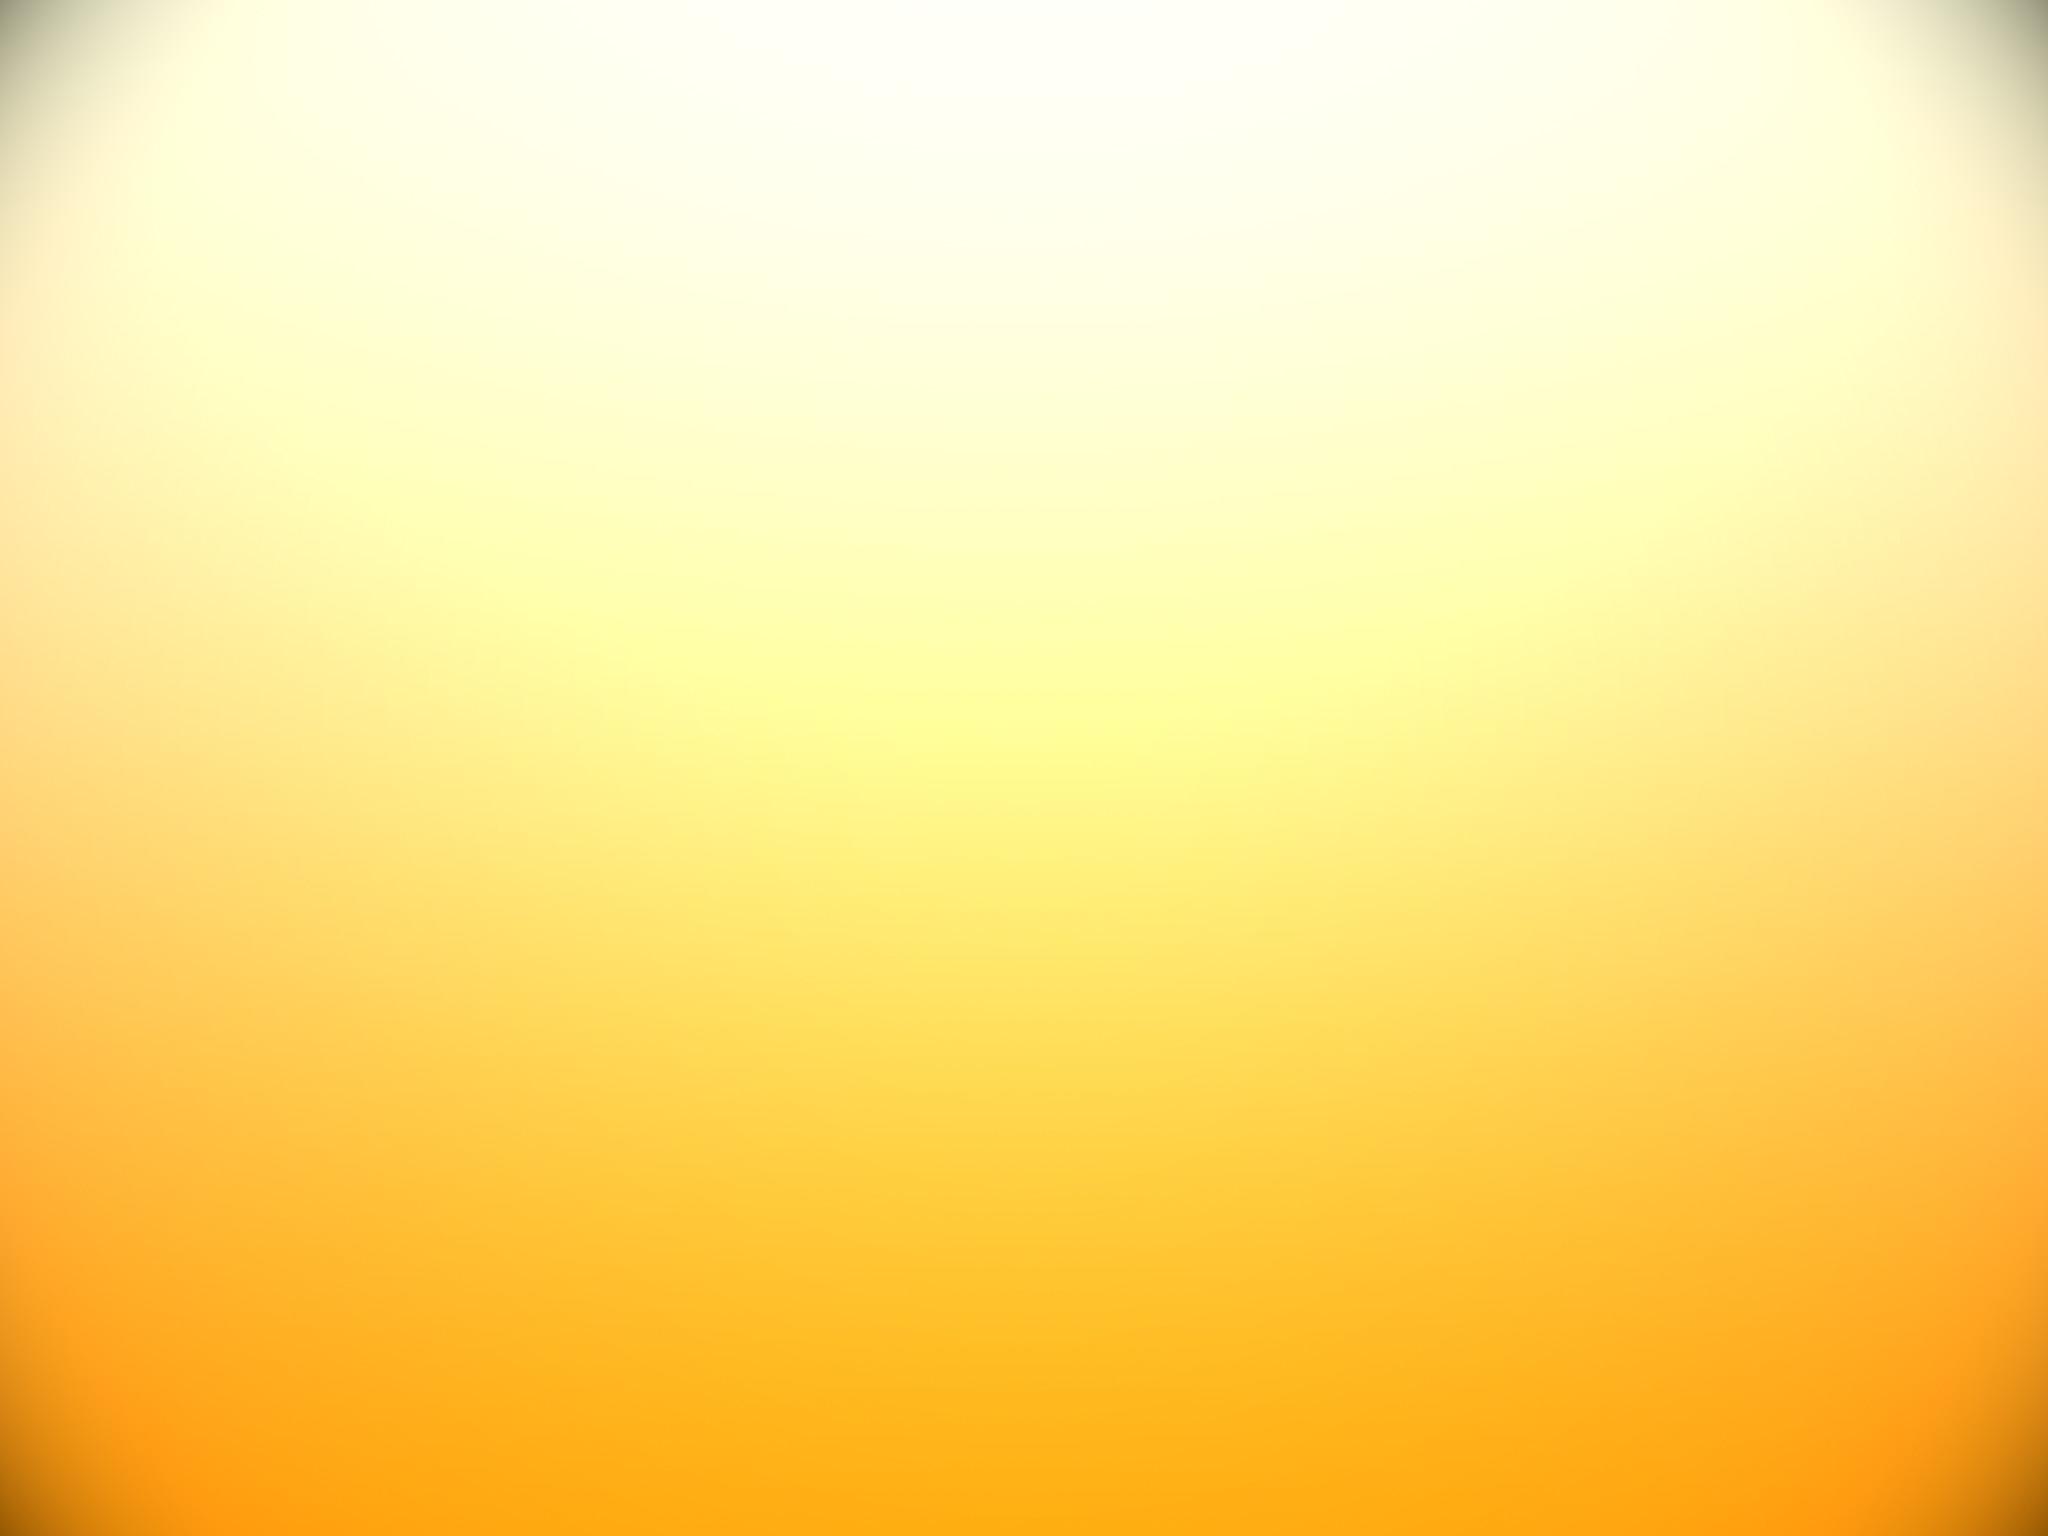 Orange Light Background